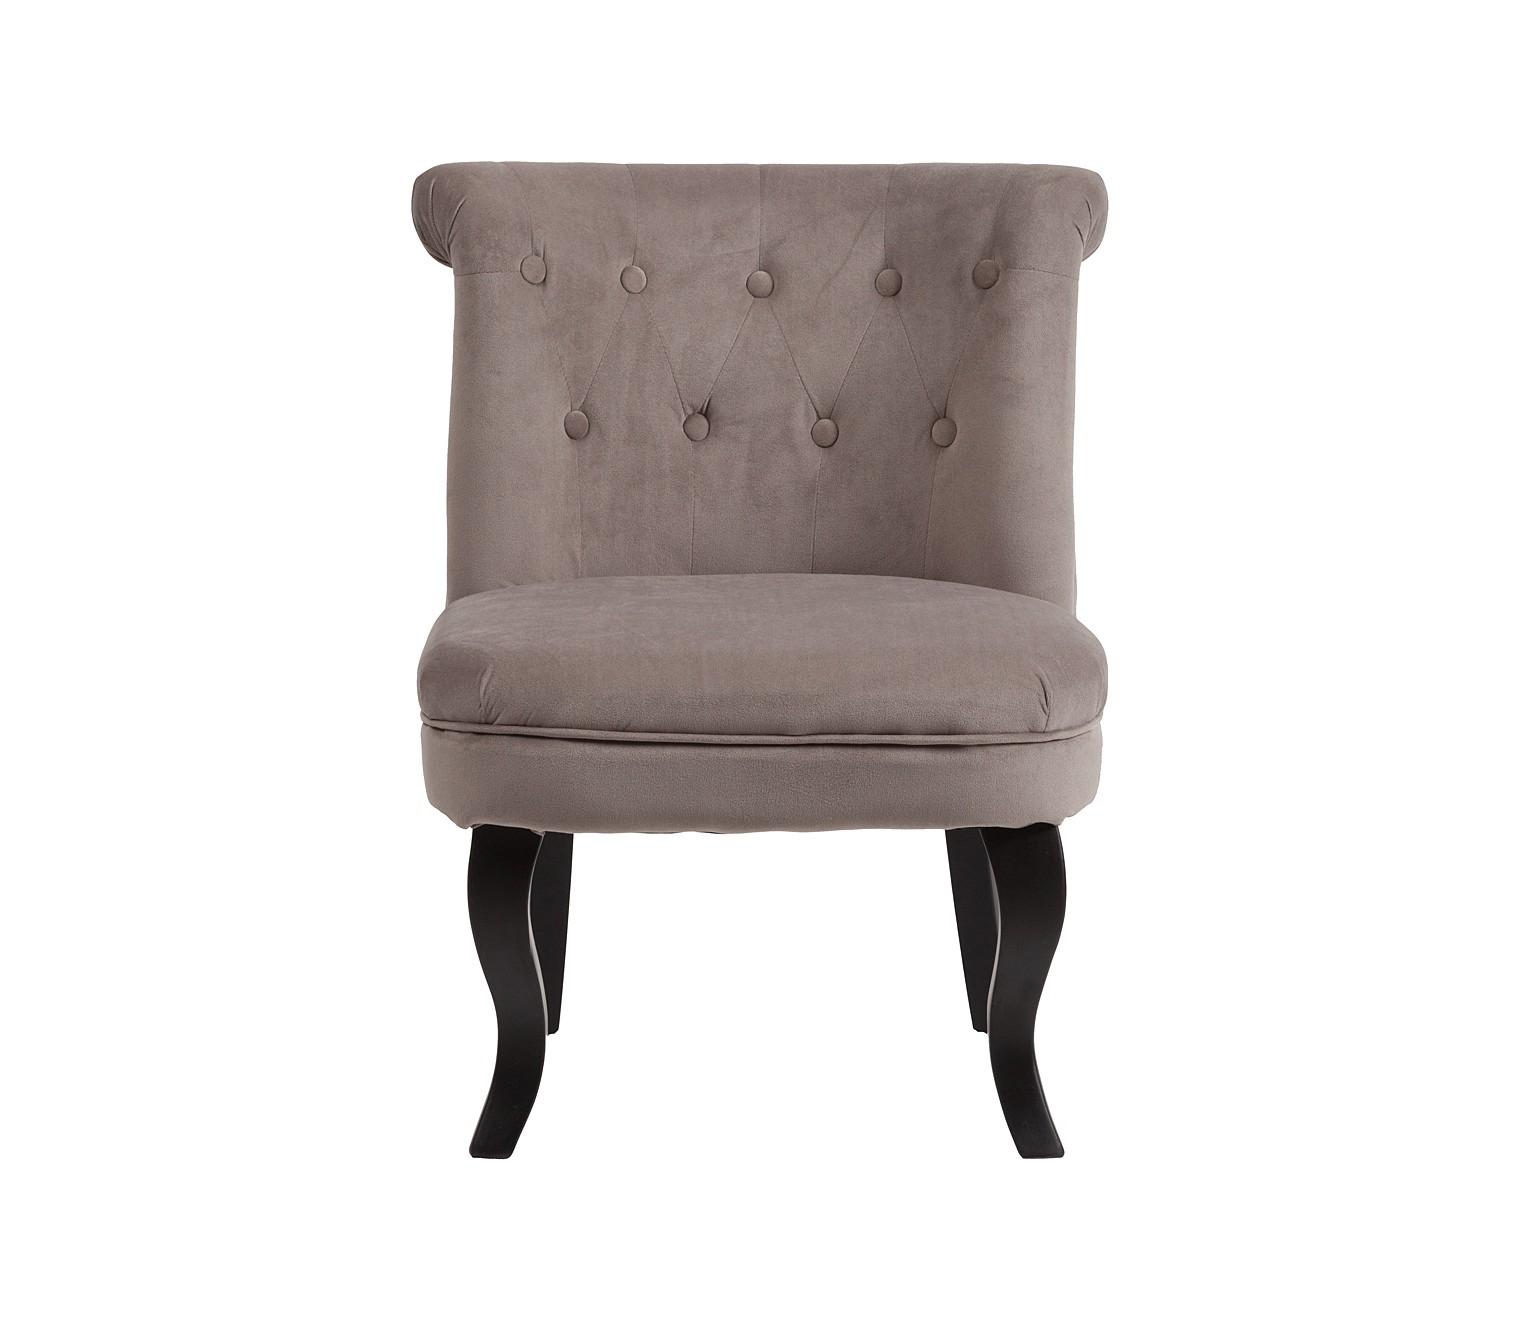 Кресло DawsonПолукресла<br><br><br>Material: Текстиль<br>Width см: 56<br>Depth см: 63<br>Height см: 73